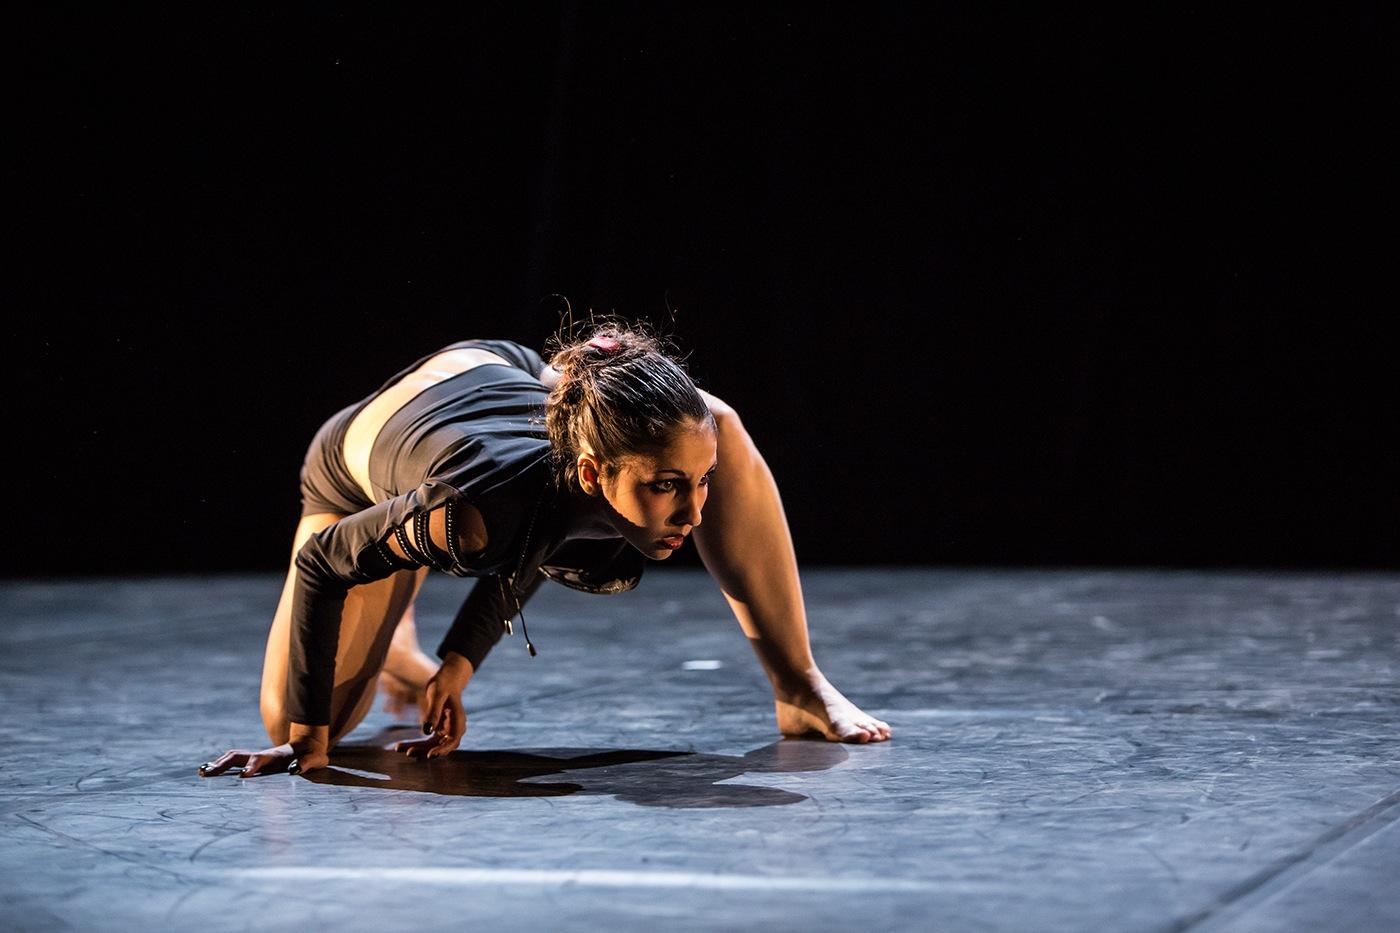 photographe-reportage-danse-avec-ton-crous-guillaume-heraud-005-small